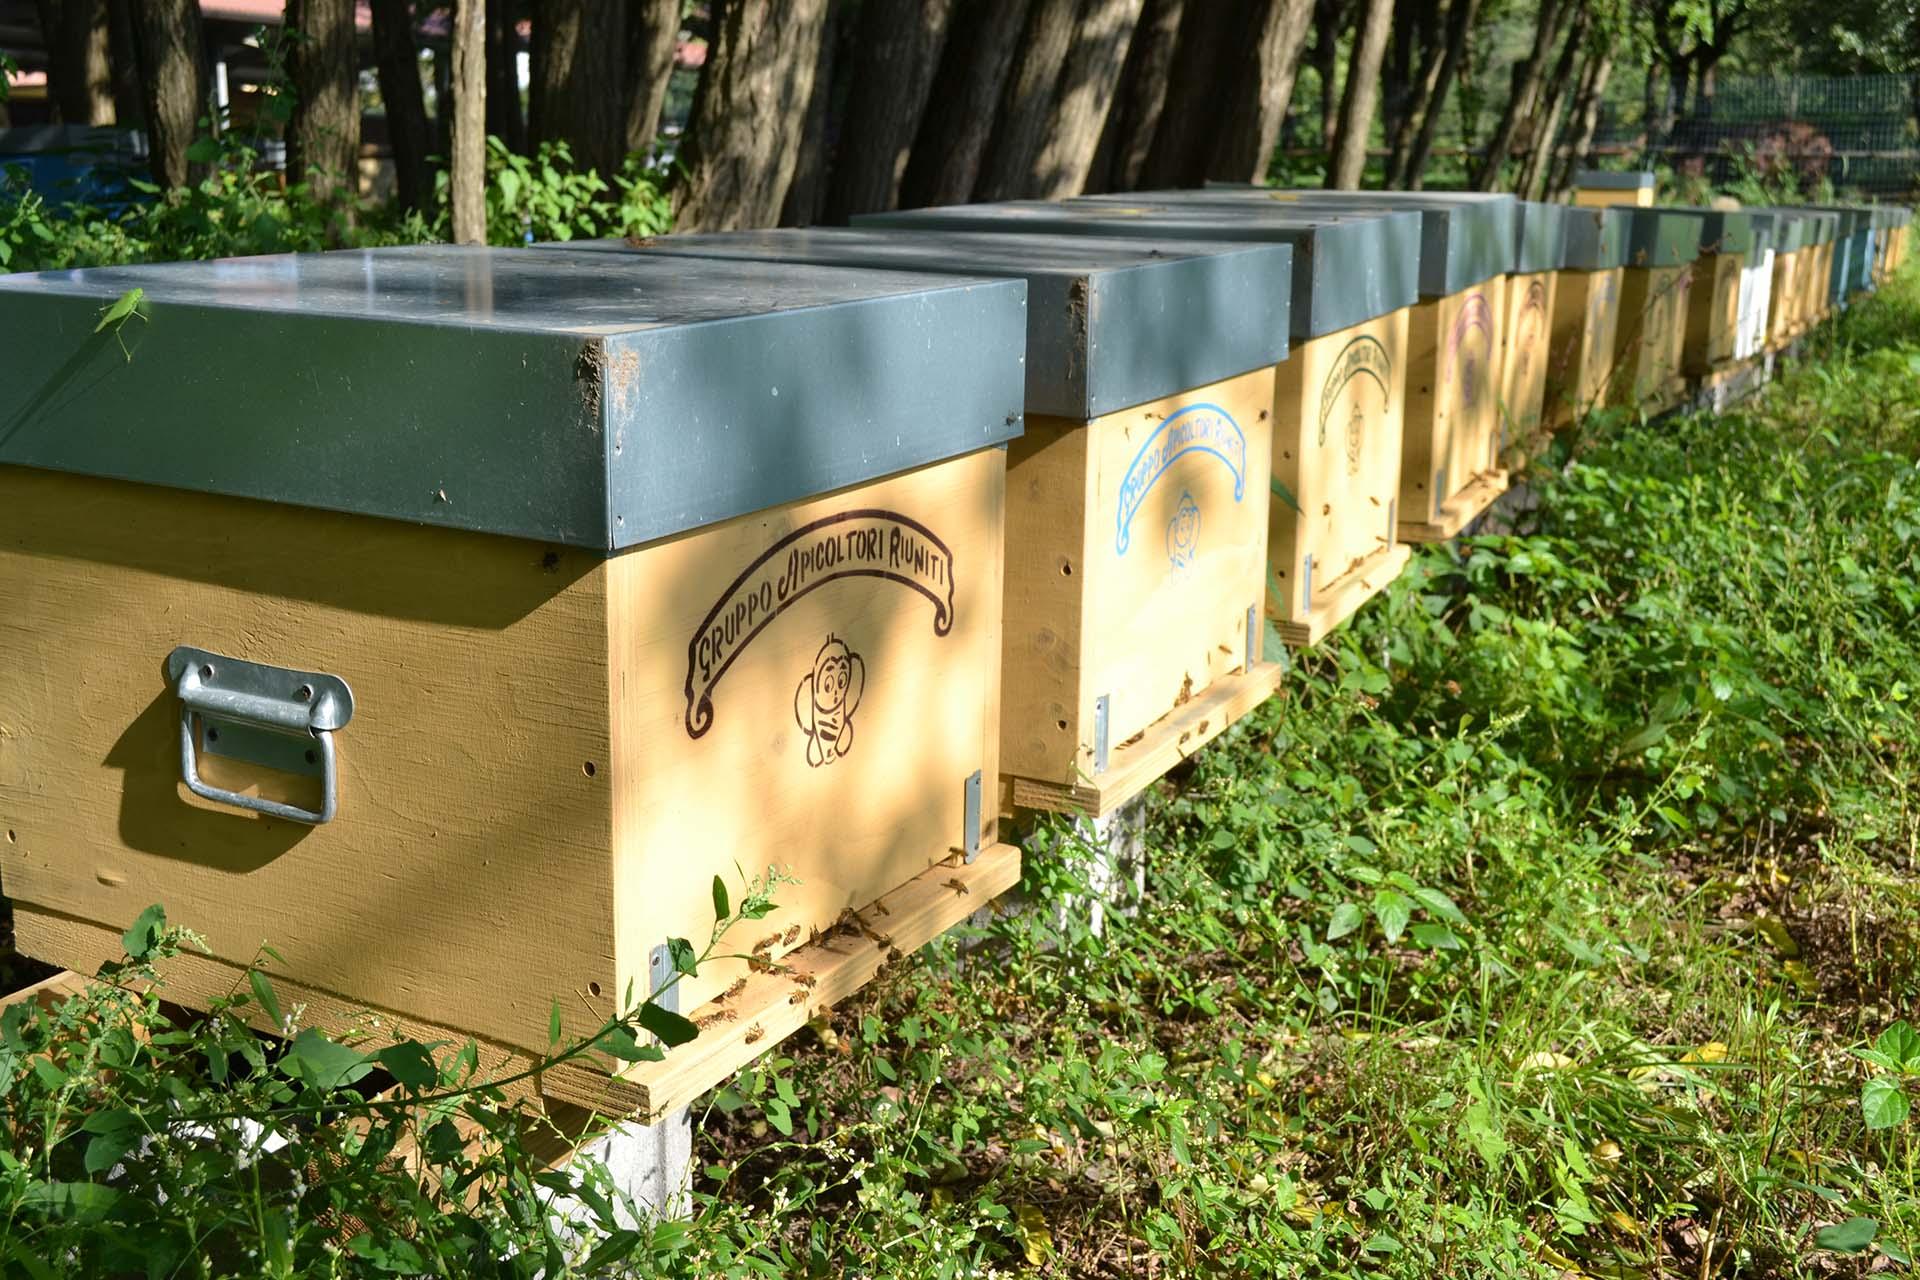 gruppo-apicoltori-riuniti-arnie.jpg